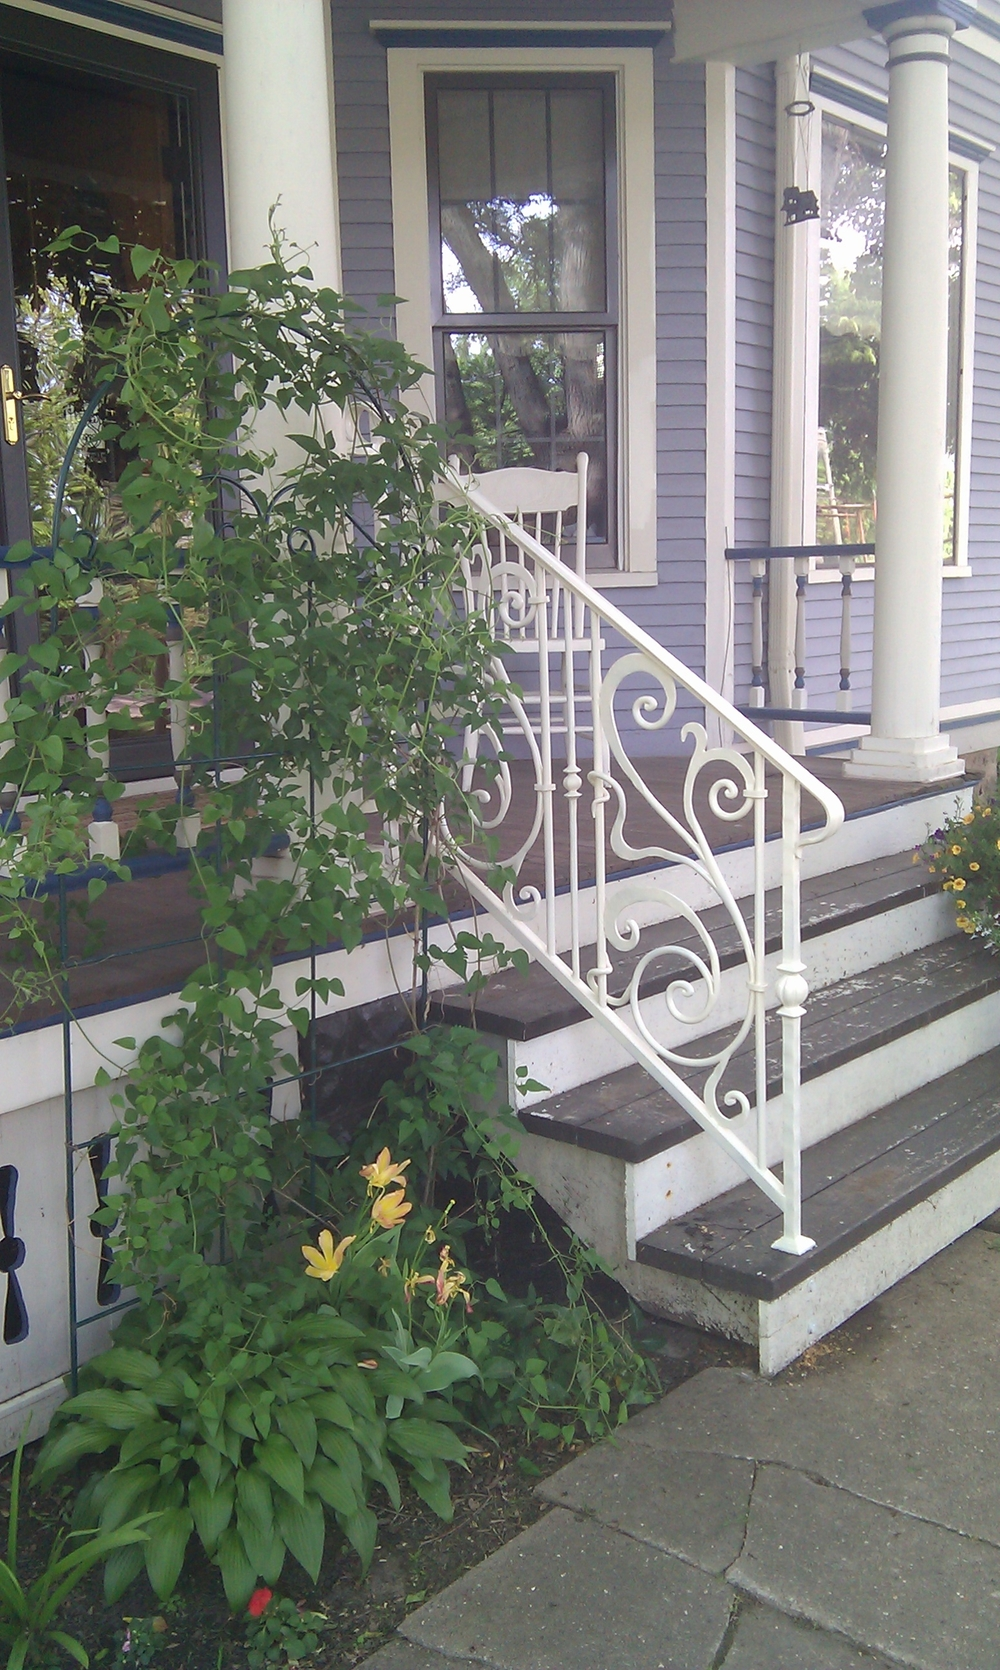 railing-2331710536-O.jpg